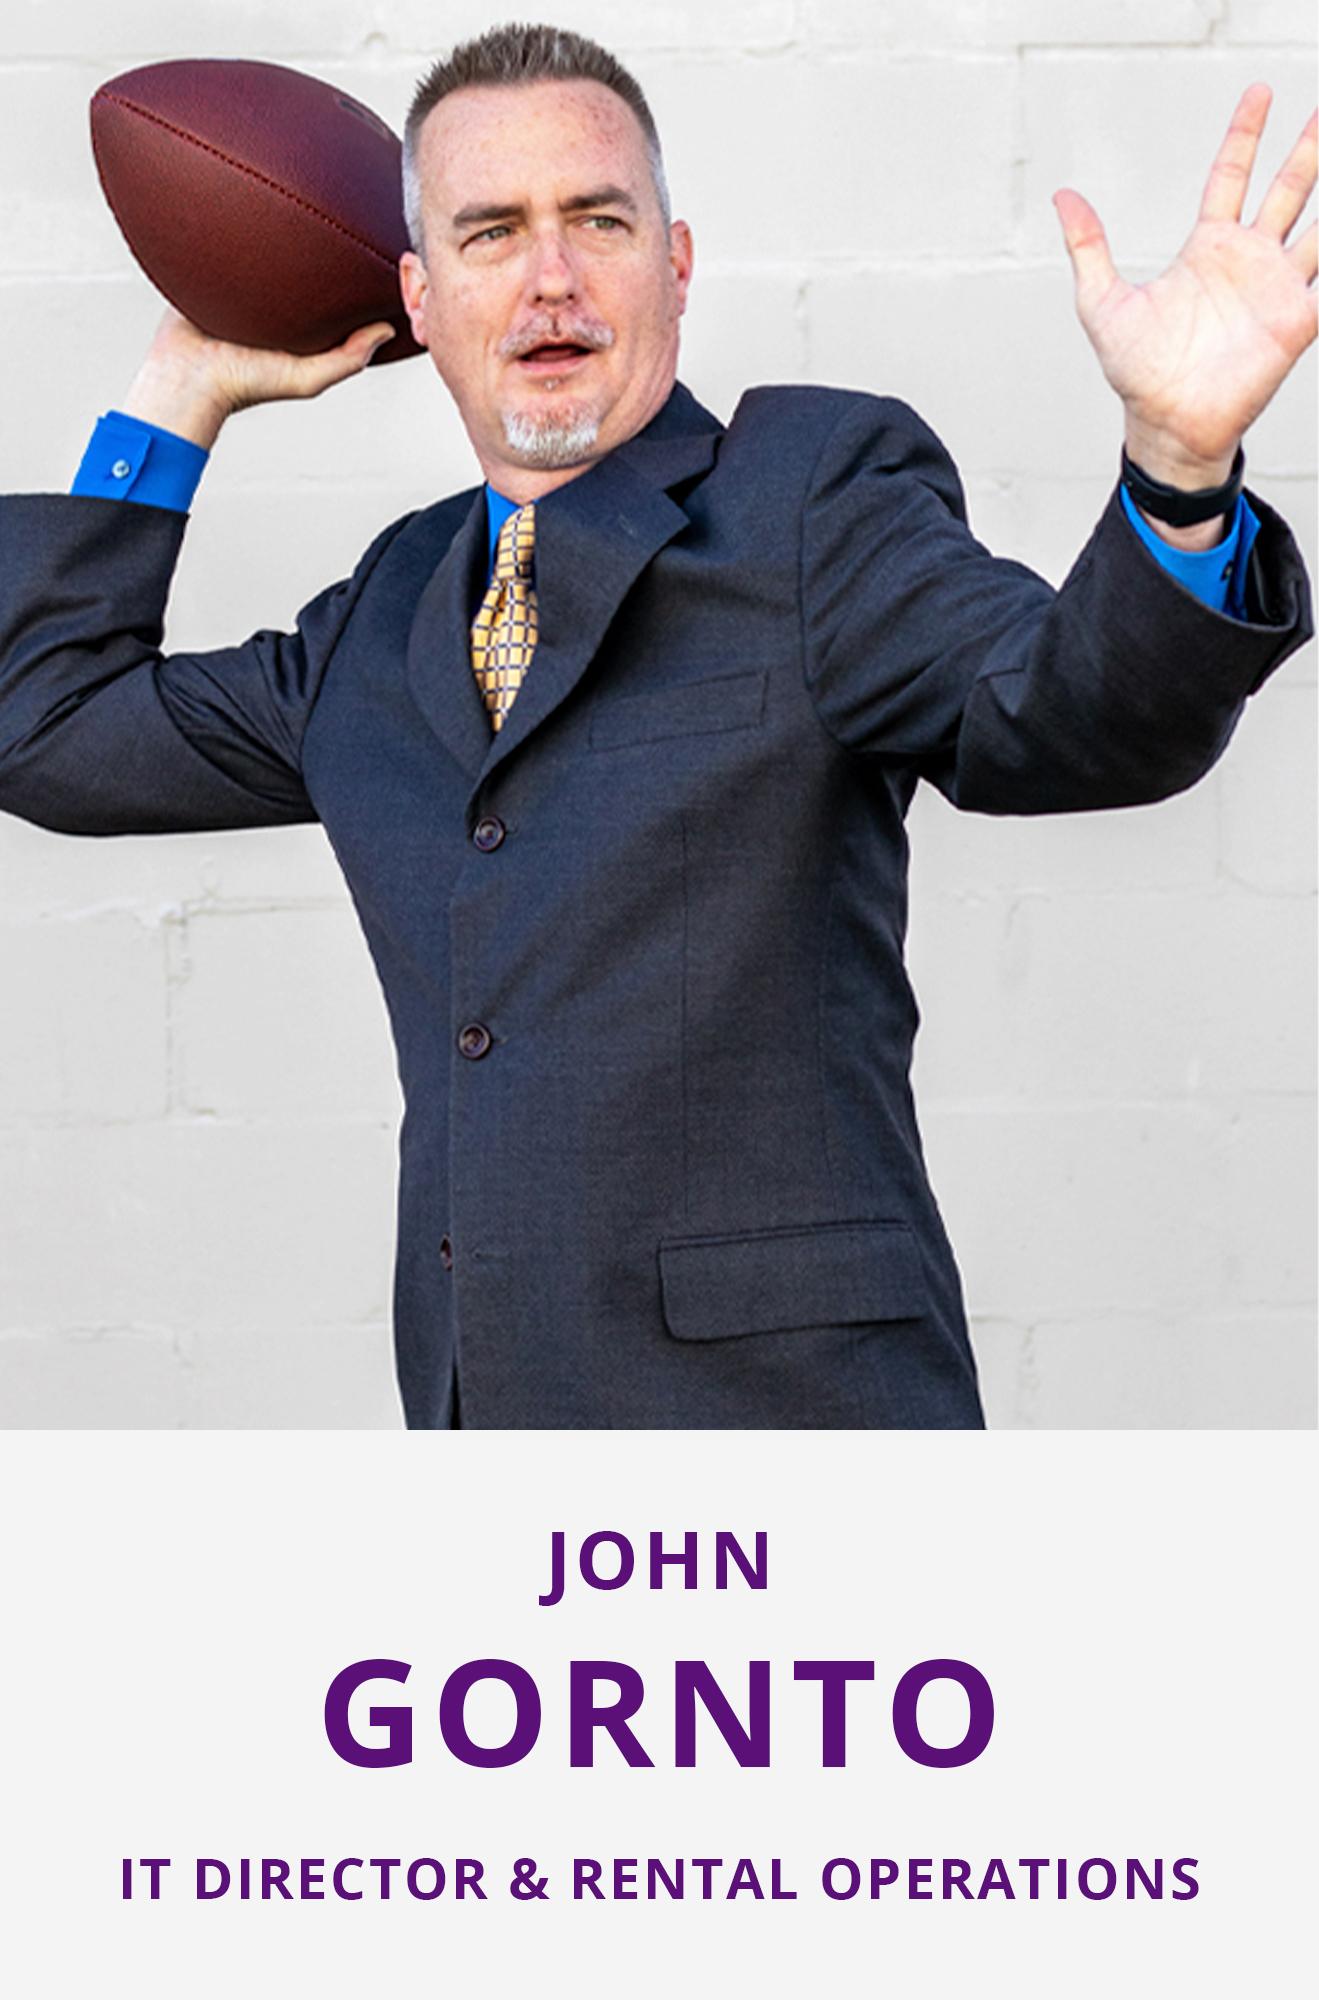 John Gornto